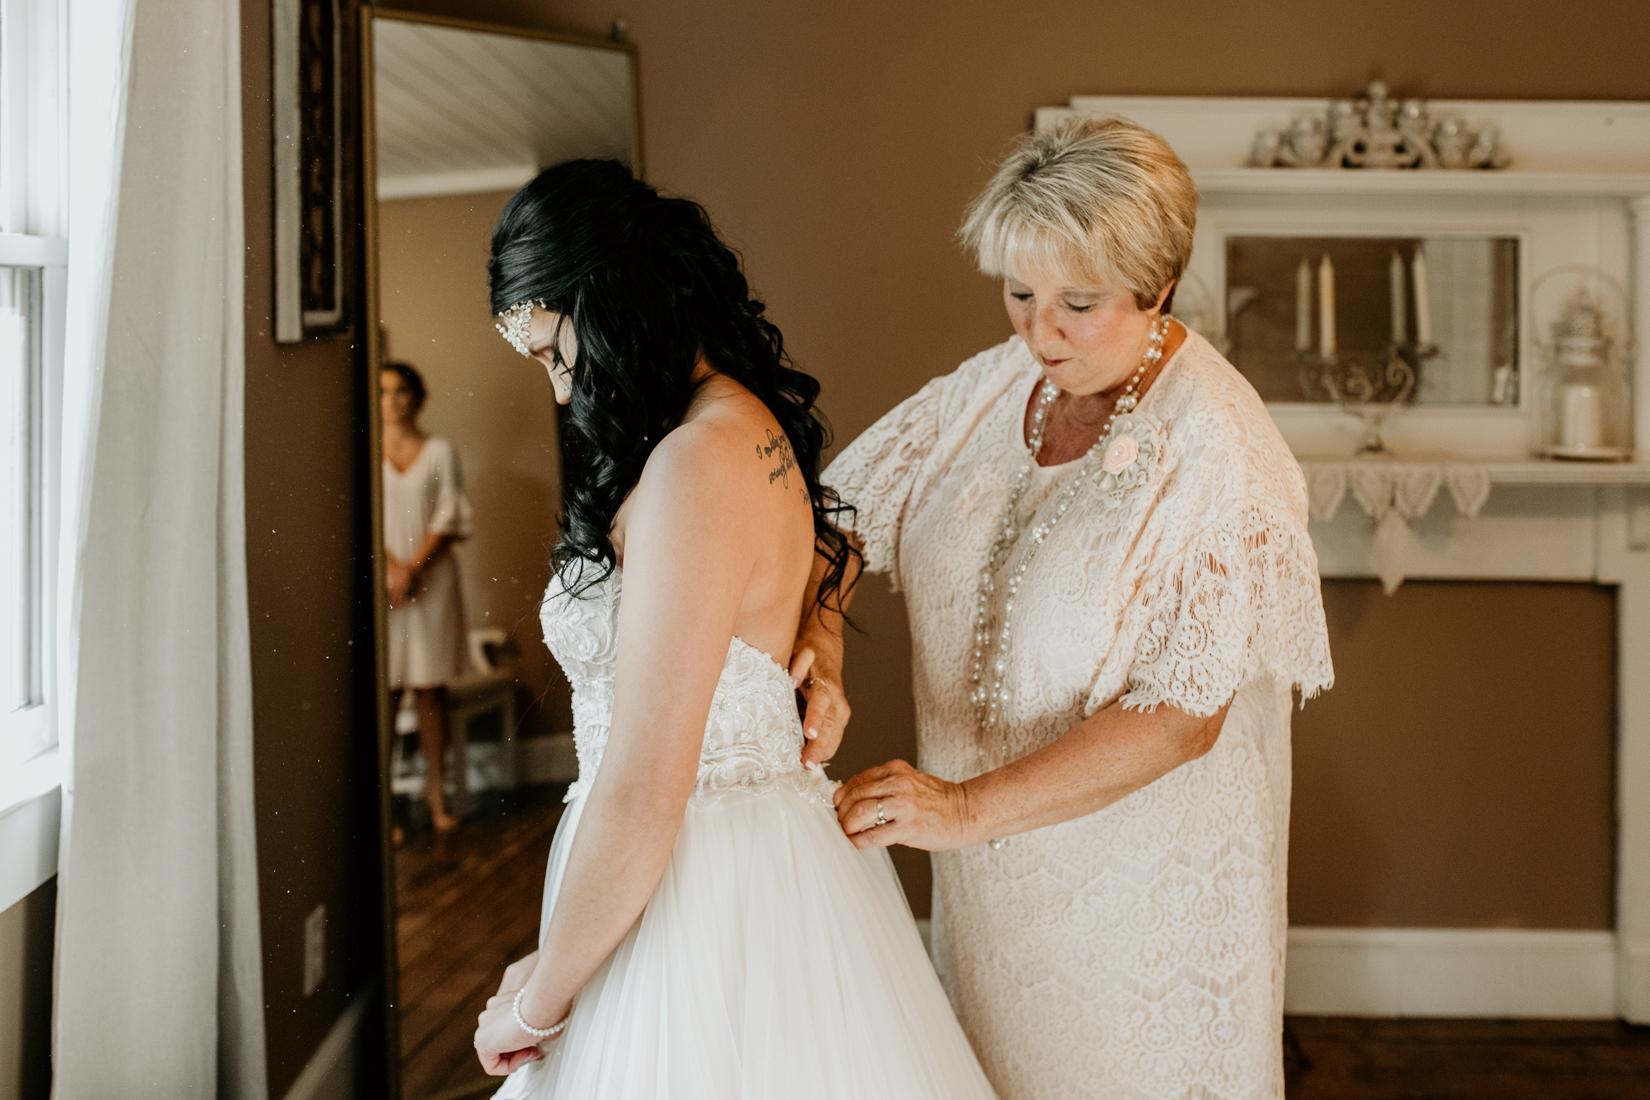 olivia_zay_wedding_09_2018-8648.jpg